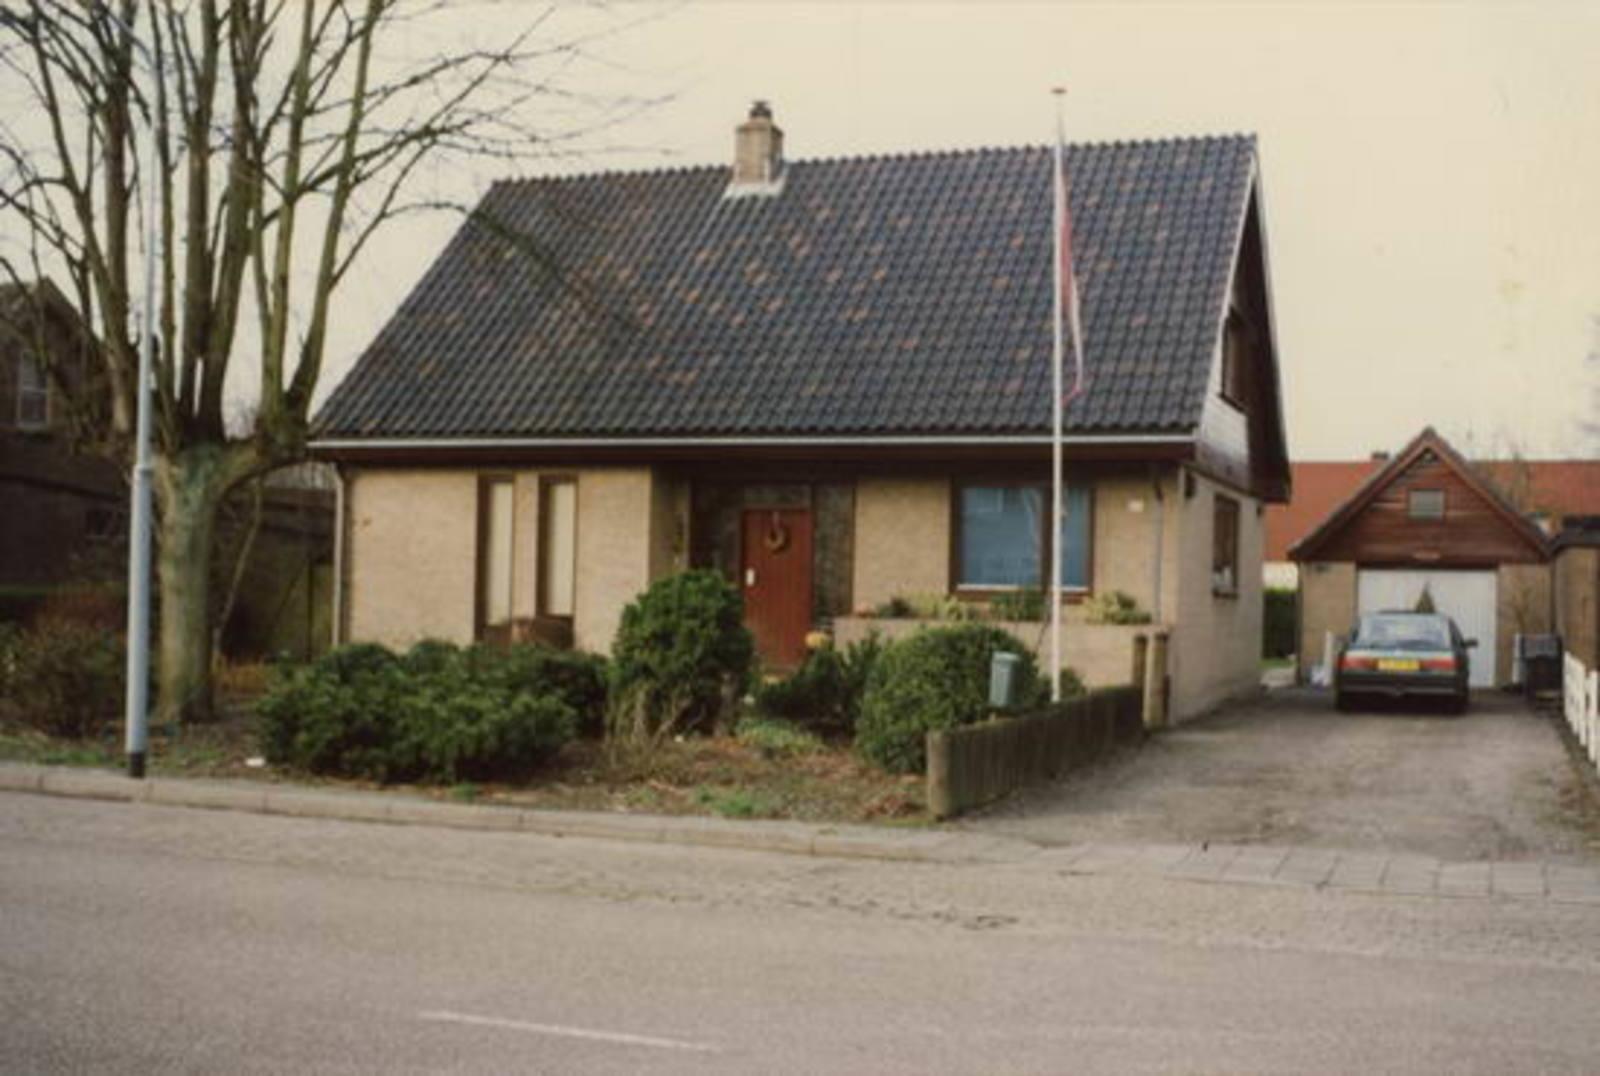 Rijnlanderweg W 0871 200_ Huize 25